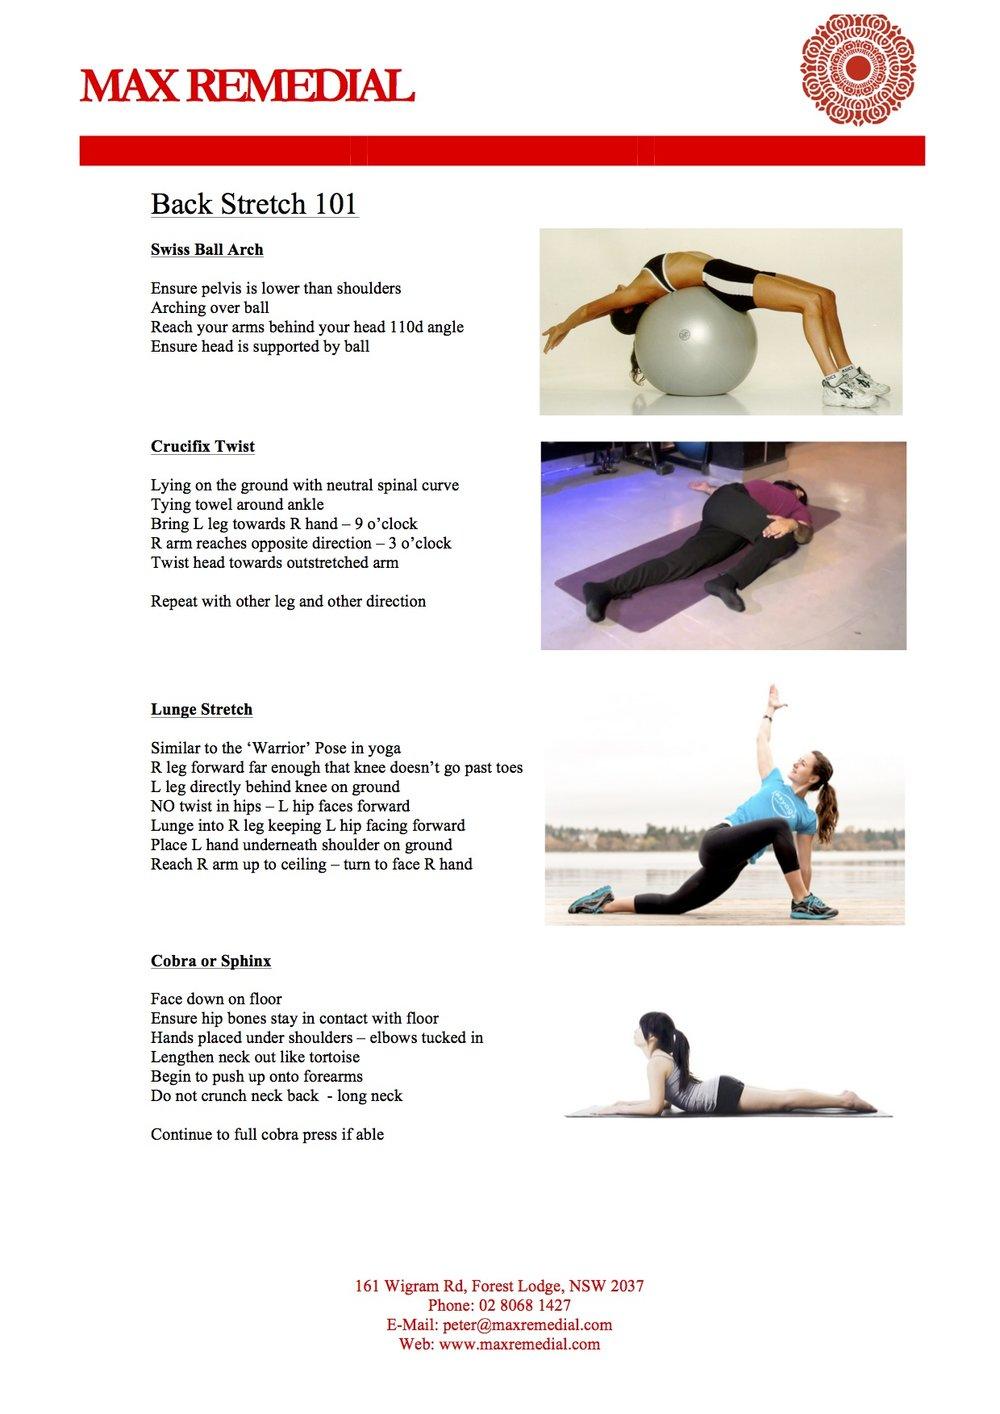 Back Stretch 101 copy.jpg